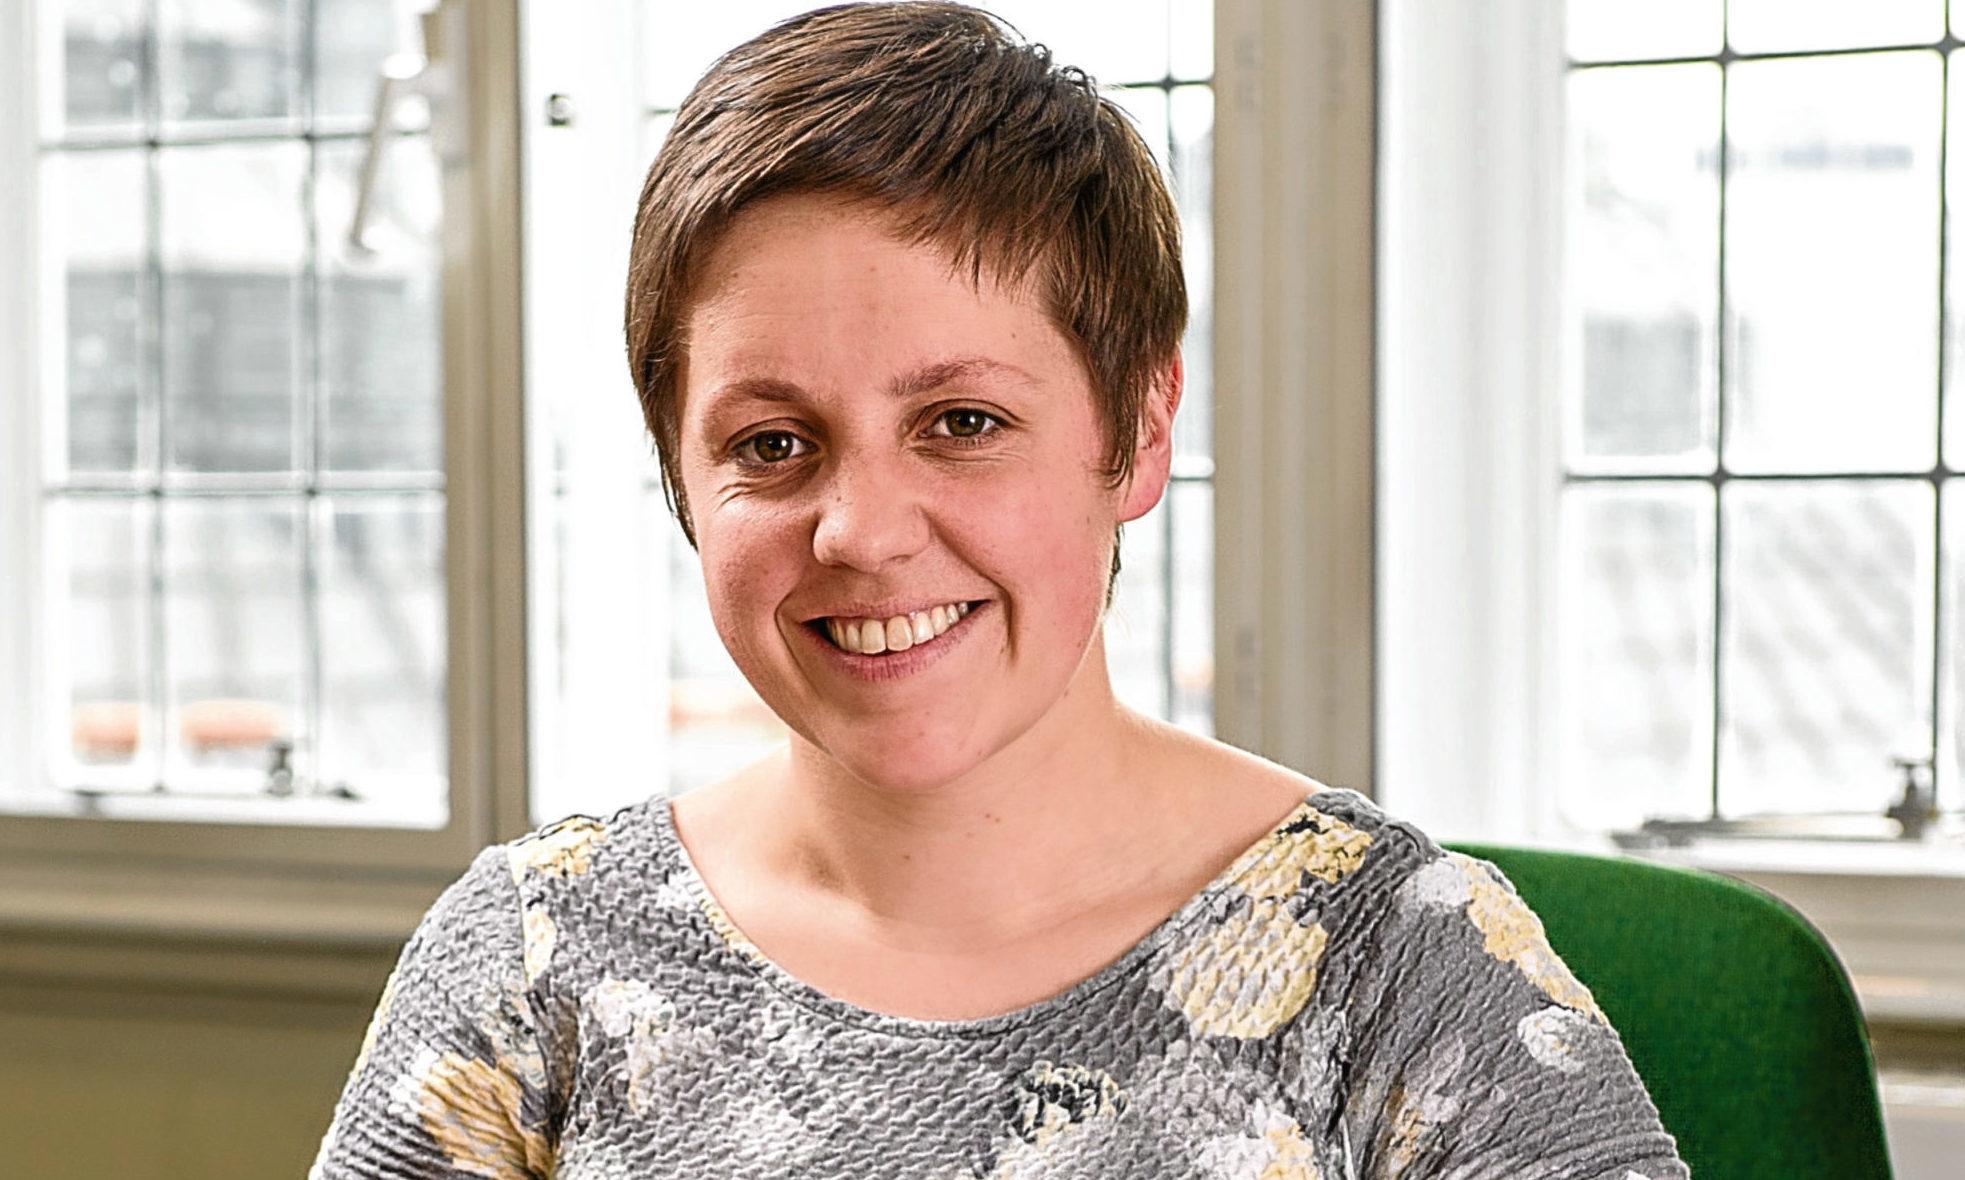 Aberdeen North SNP MP Kirsty Blackman.